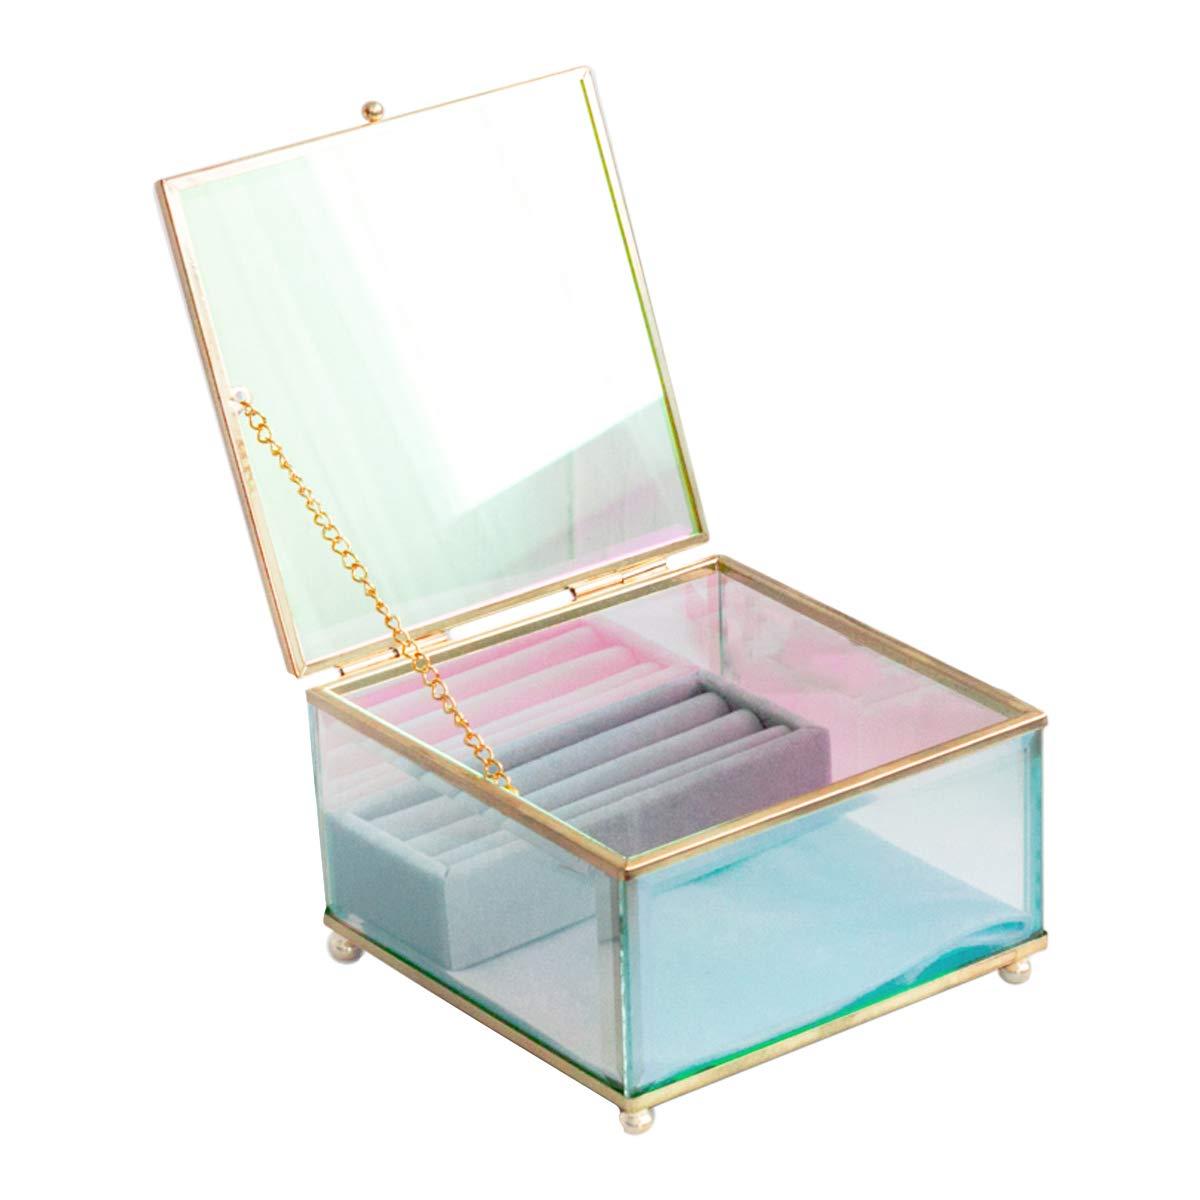 Moosy Life Aurora Borealis 珠宝镜盒带天鹅绒耳环托盘